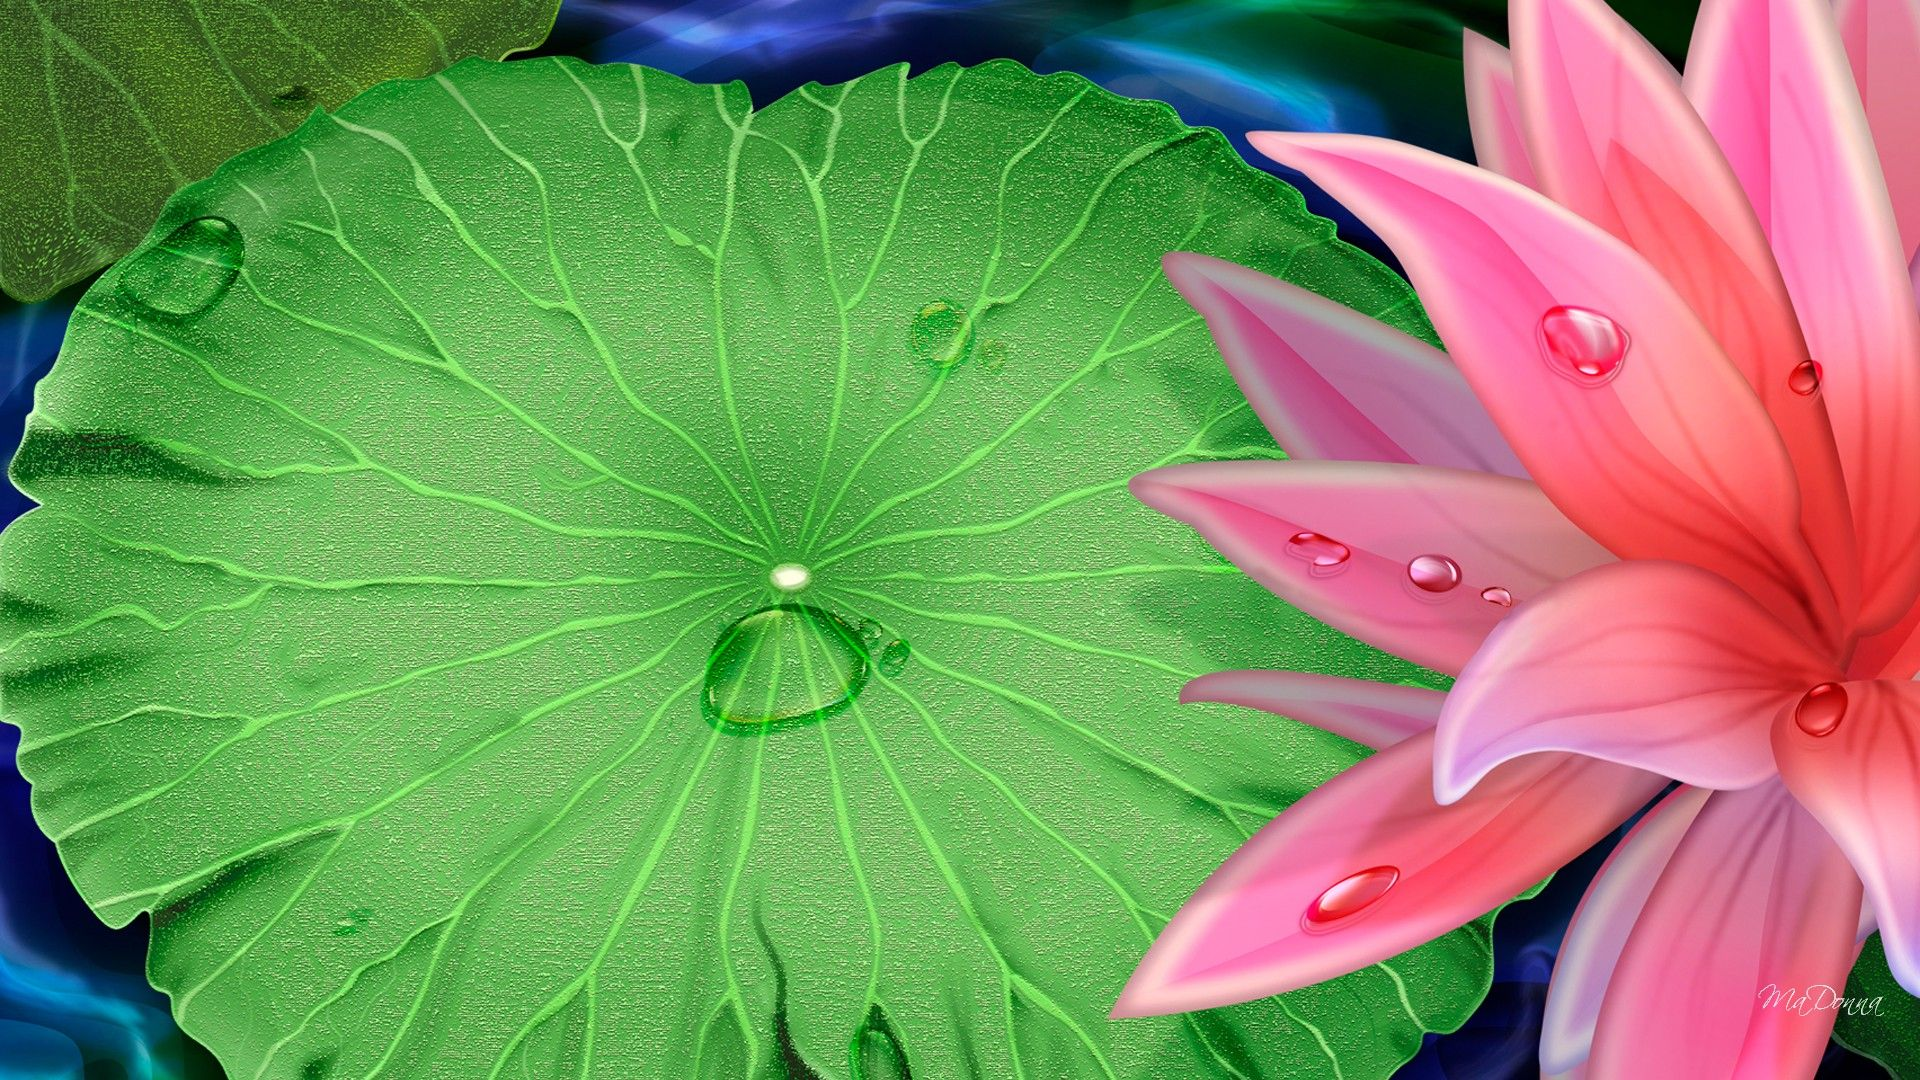 Tattoo idea Flower wallpaper, Lily wallpaper, Lotus